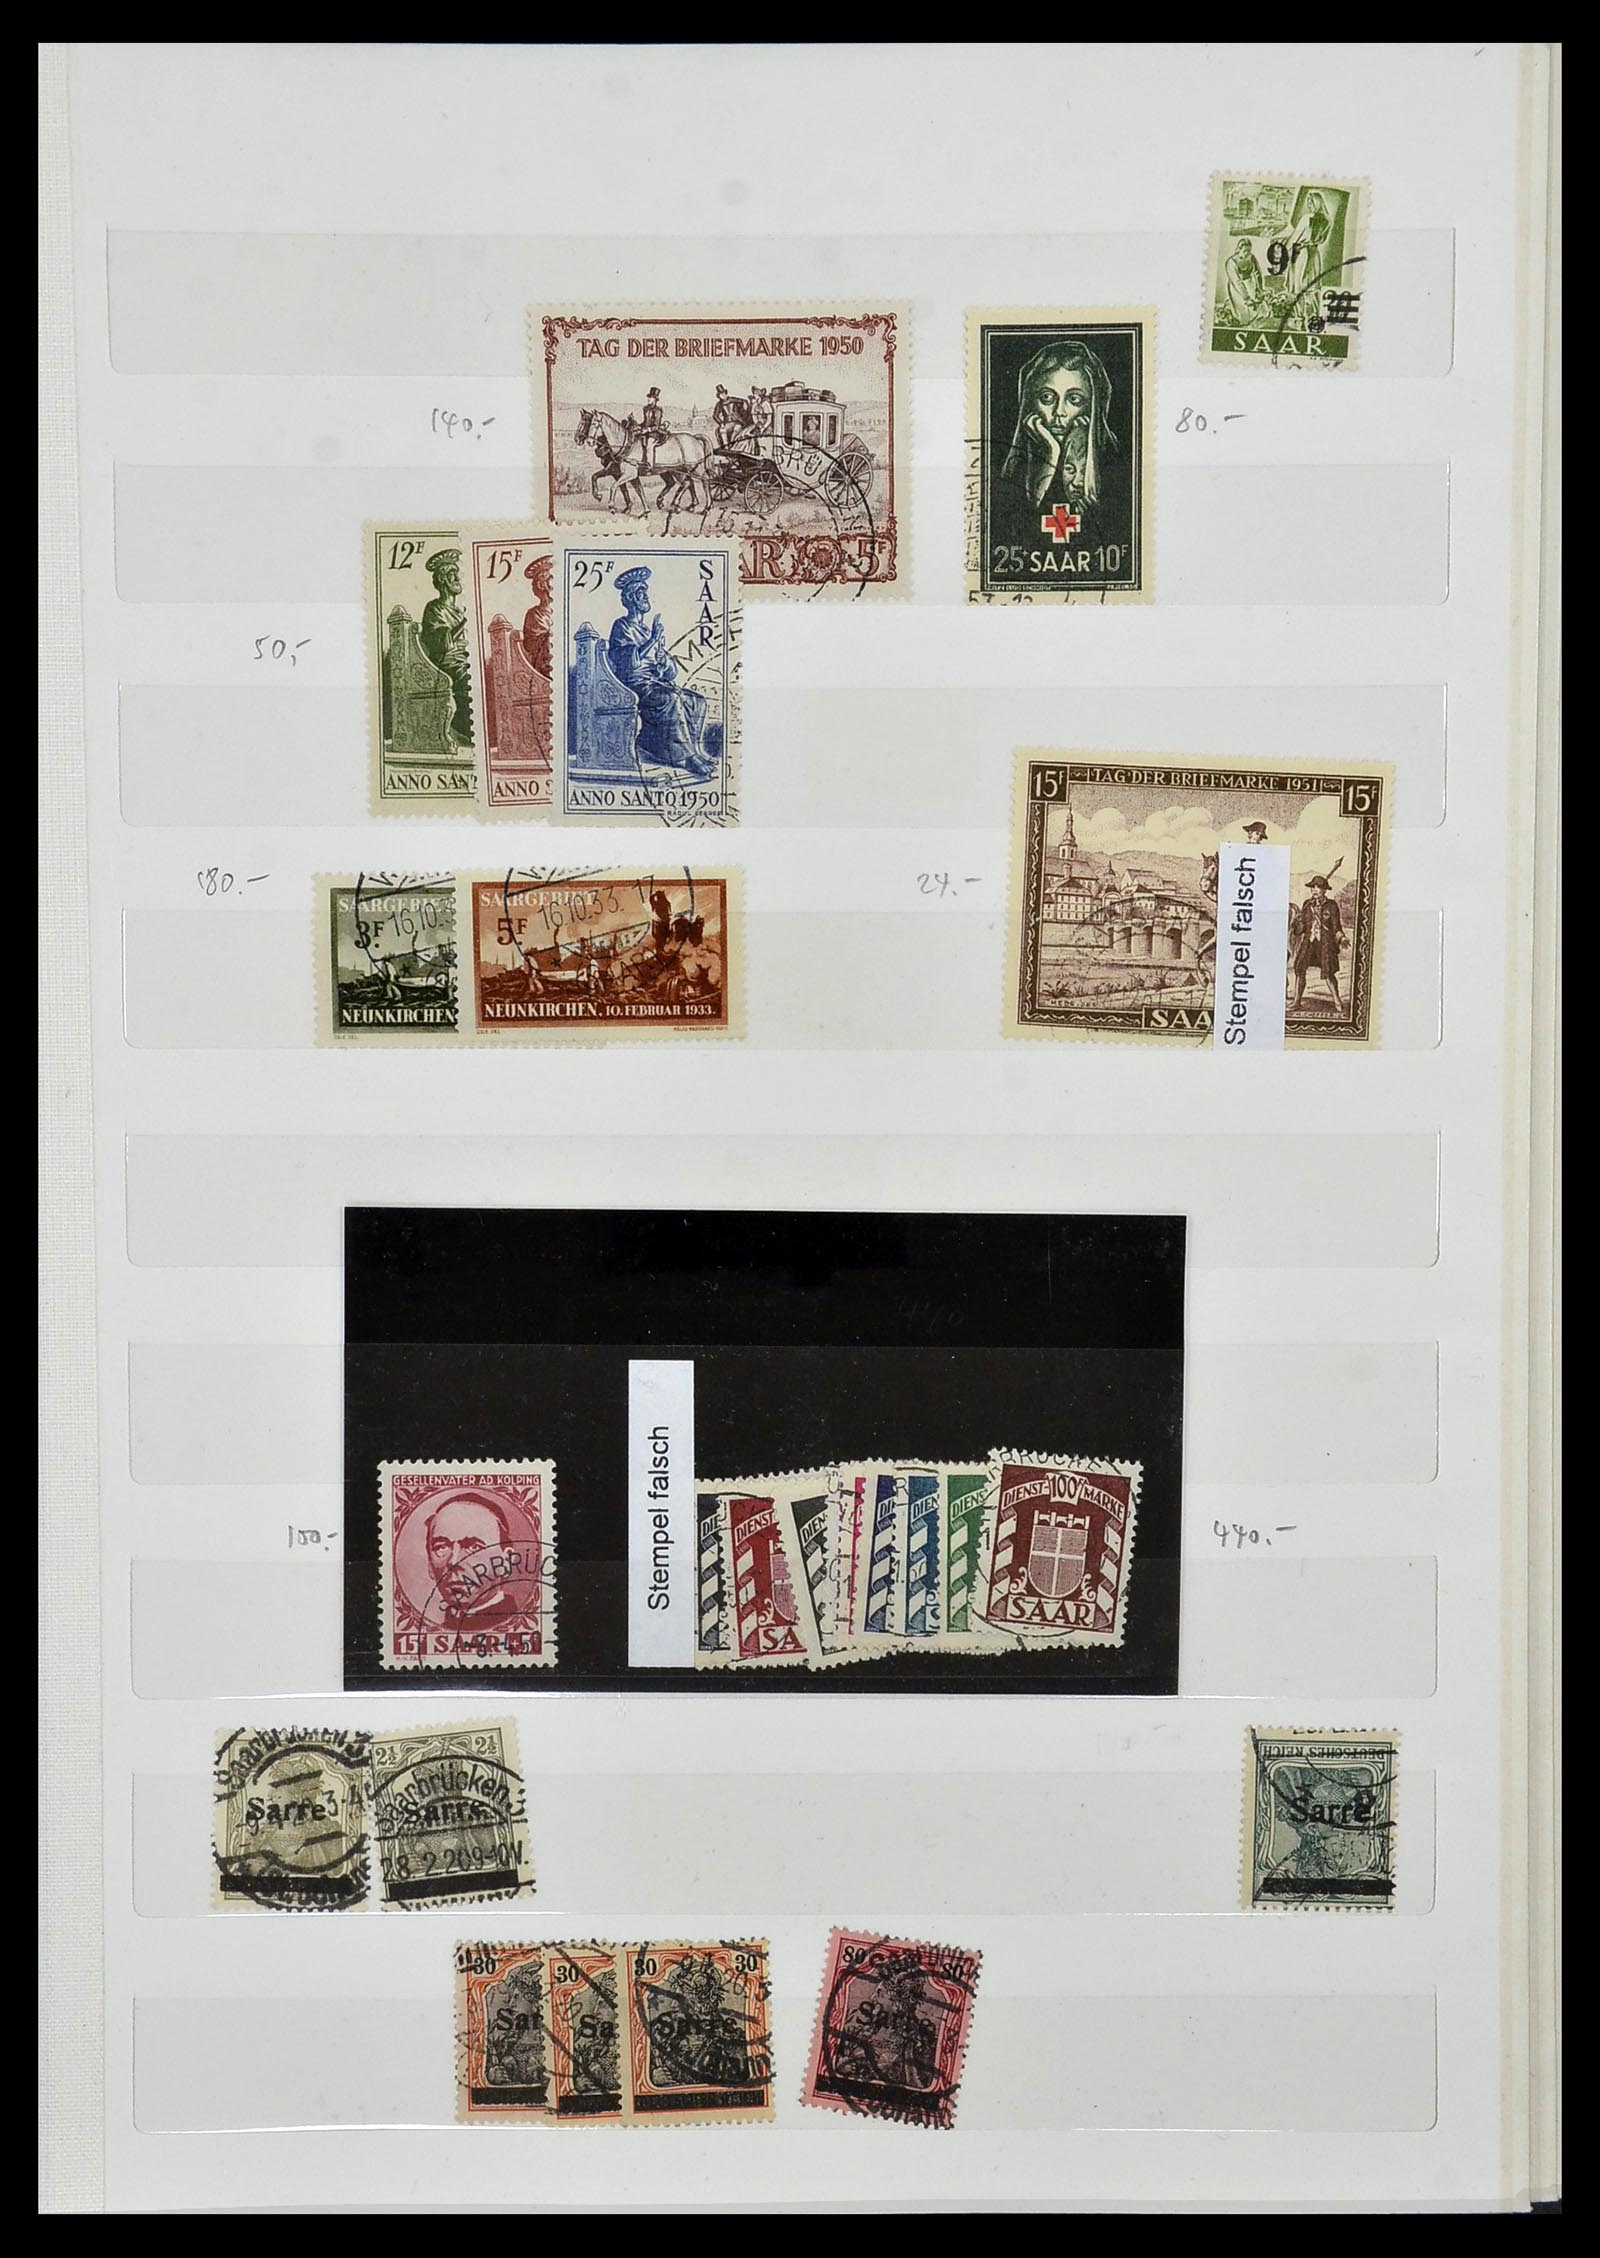 34069 007 - Postzegelverzameling 34069 Duitsland 1855-1952.